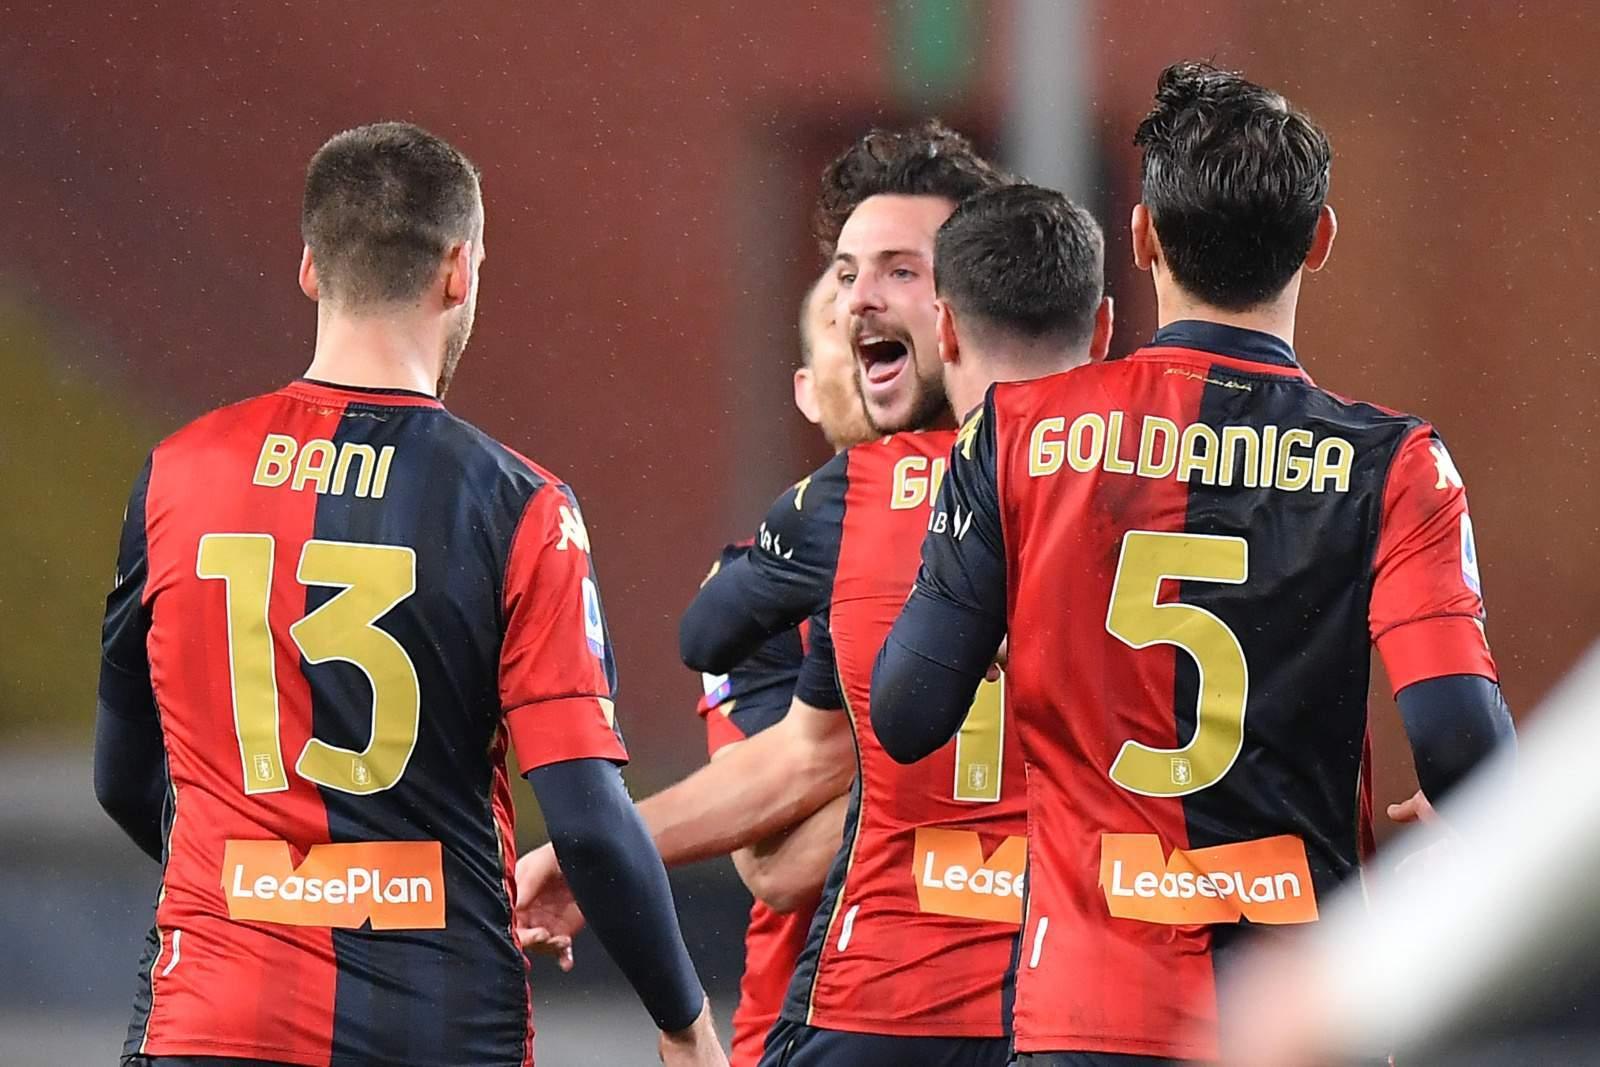 «Кальяри» - «Дженоа»: прогноз на матч чемпионата Италии - 12 сентября 2021